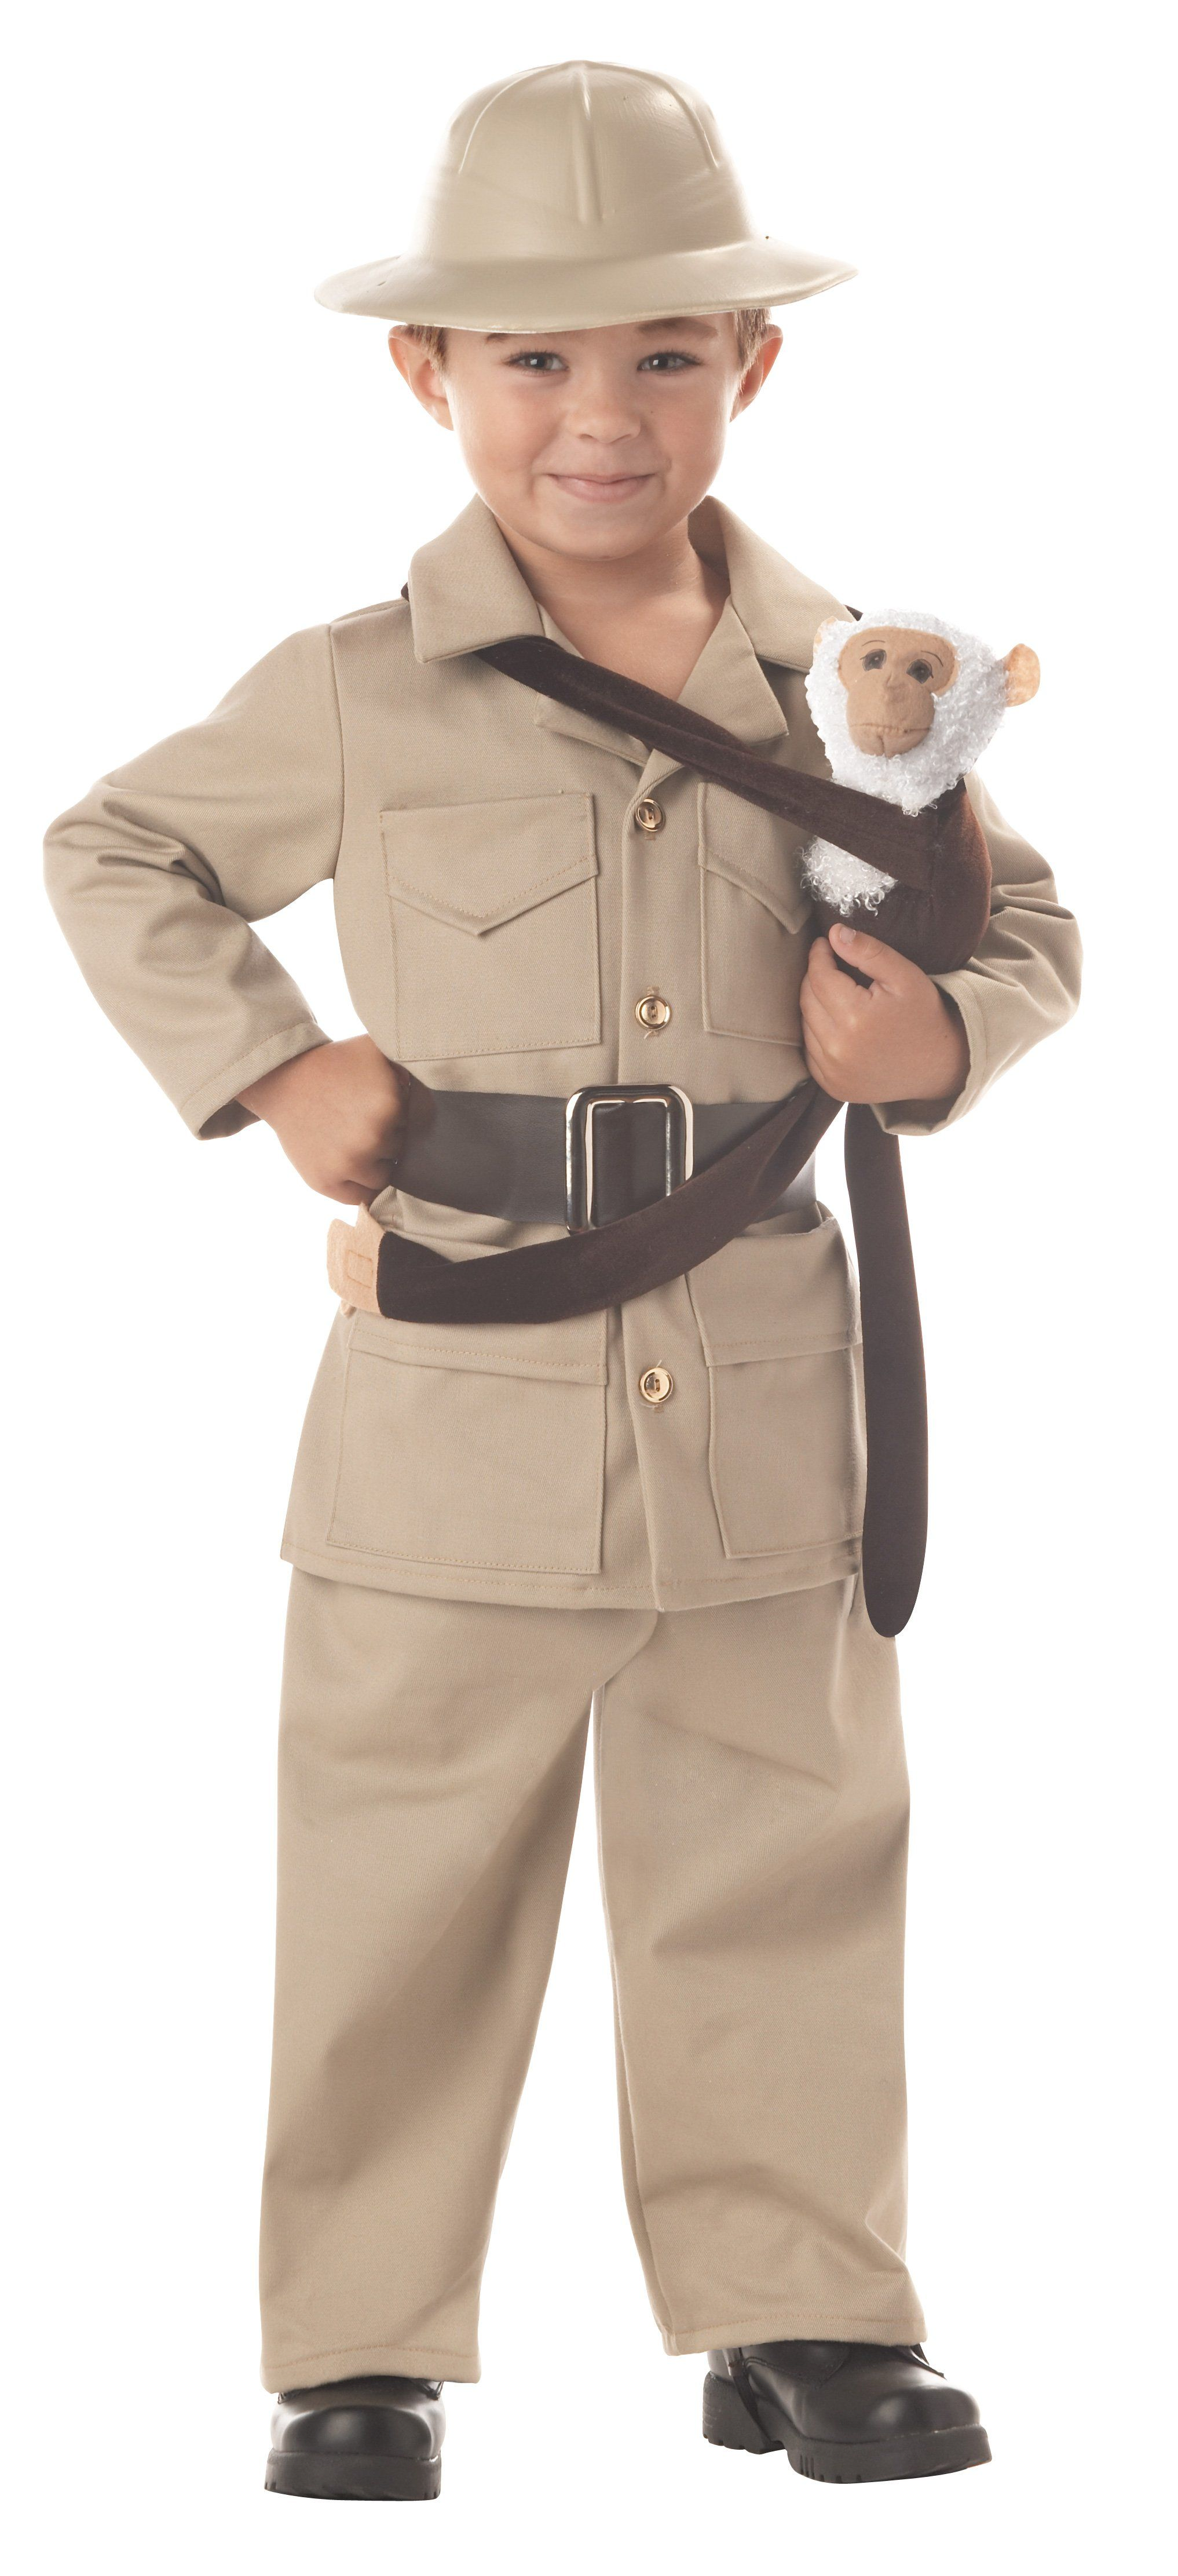 Kids Halloween Costume Wild Life  Zoo Keeper Expert Archaeologist Park Ranger